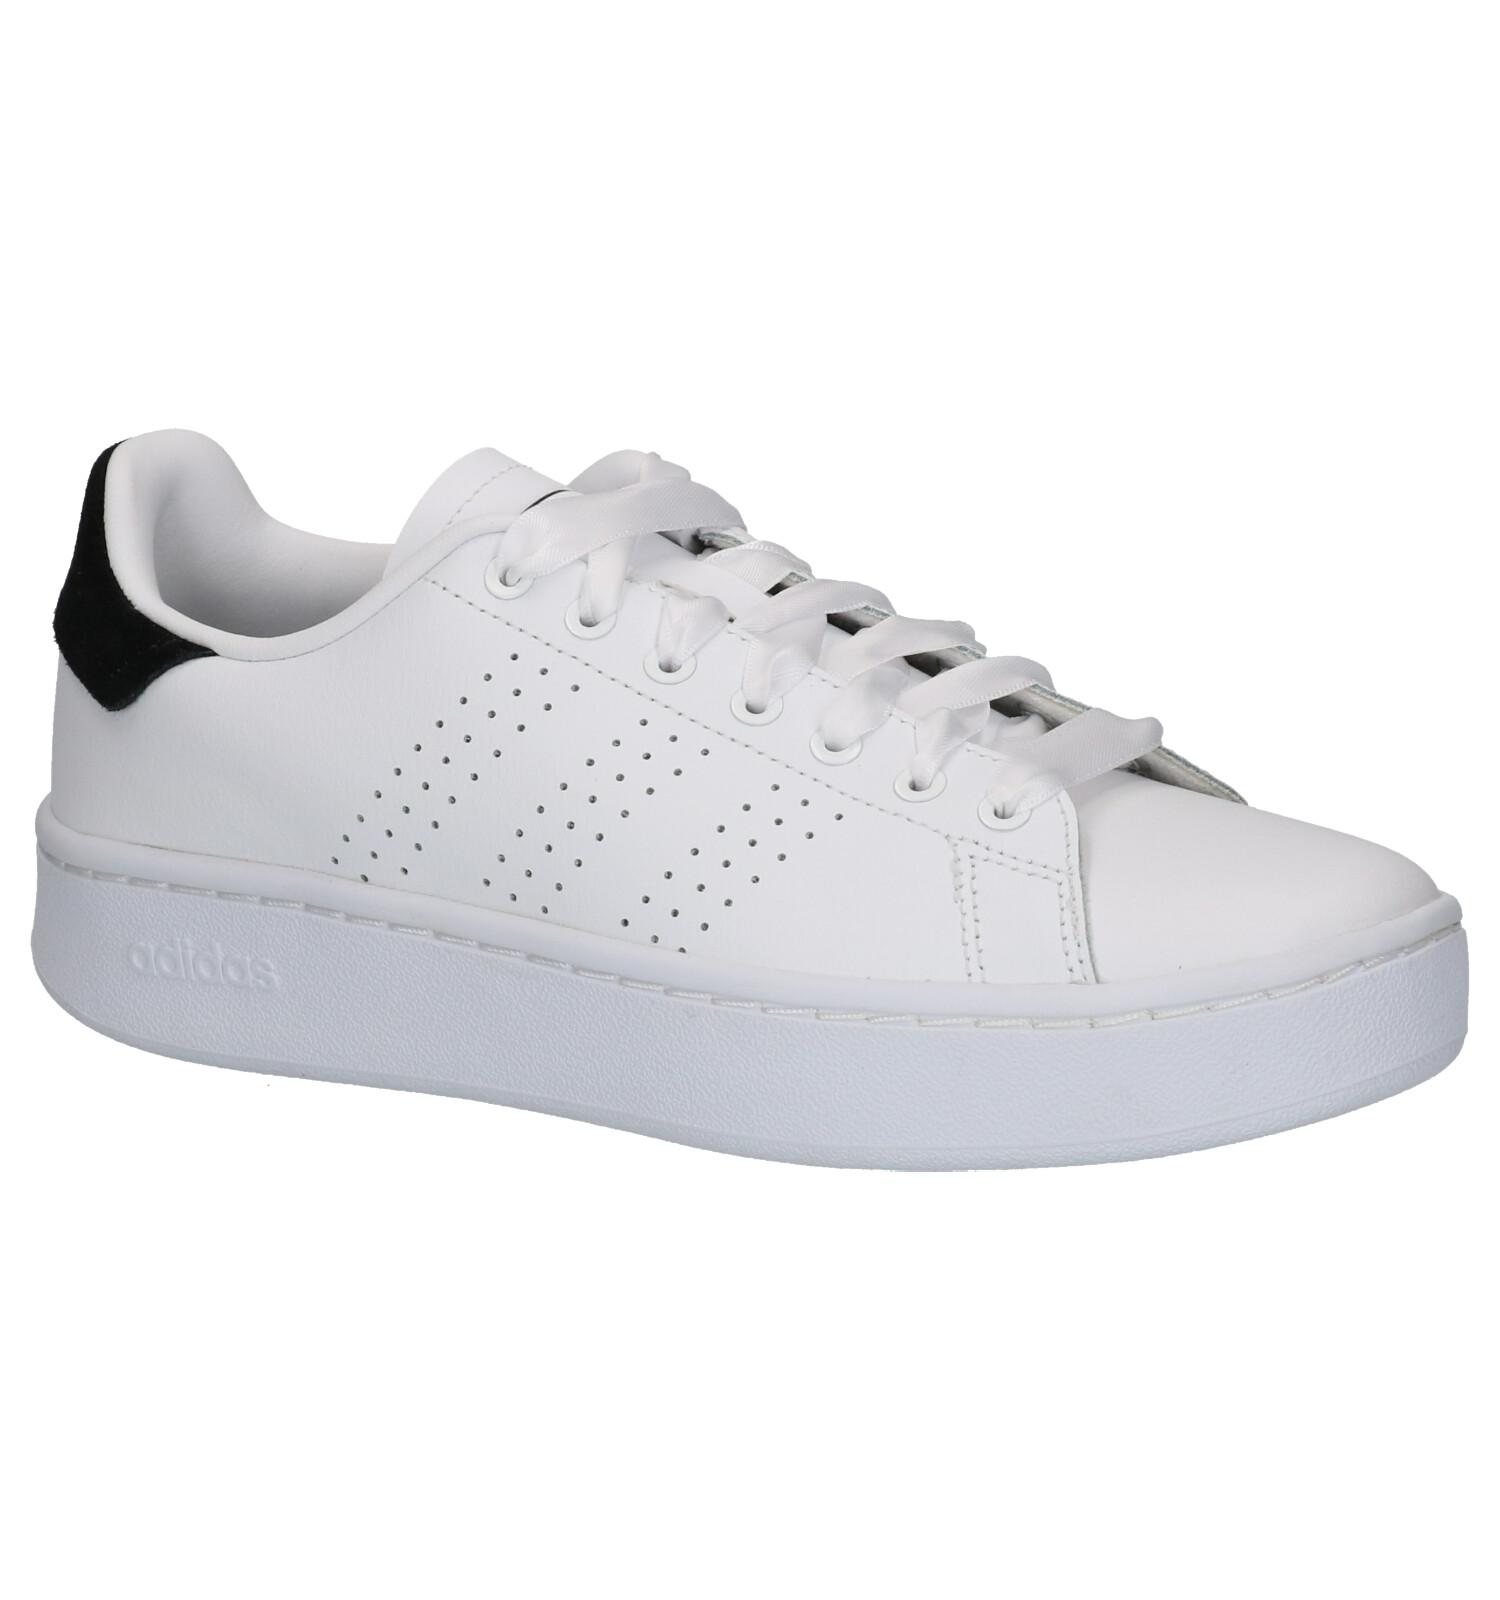 Chaussures de tennis femme adidas Advantage Bold